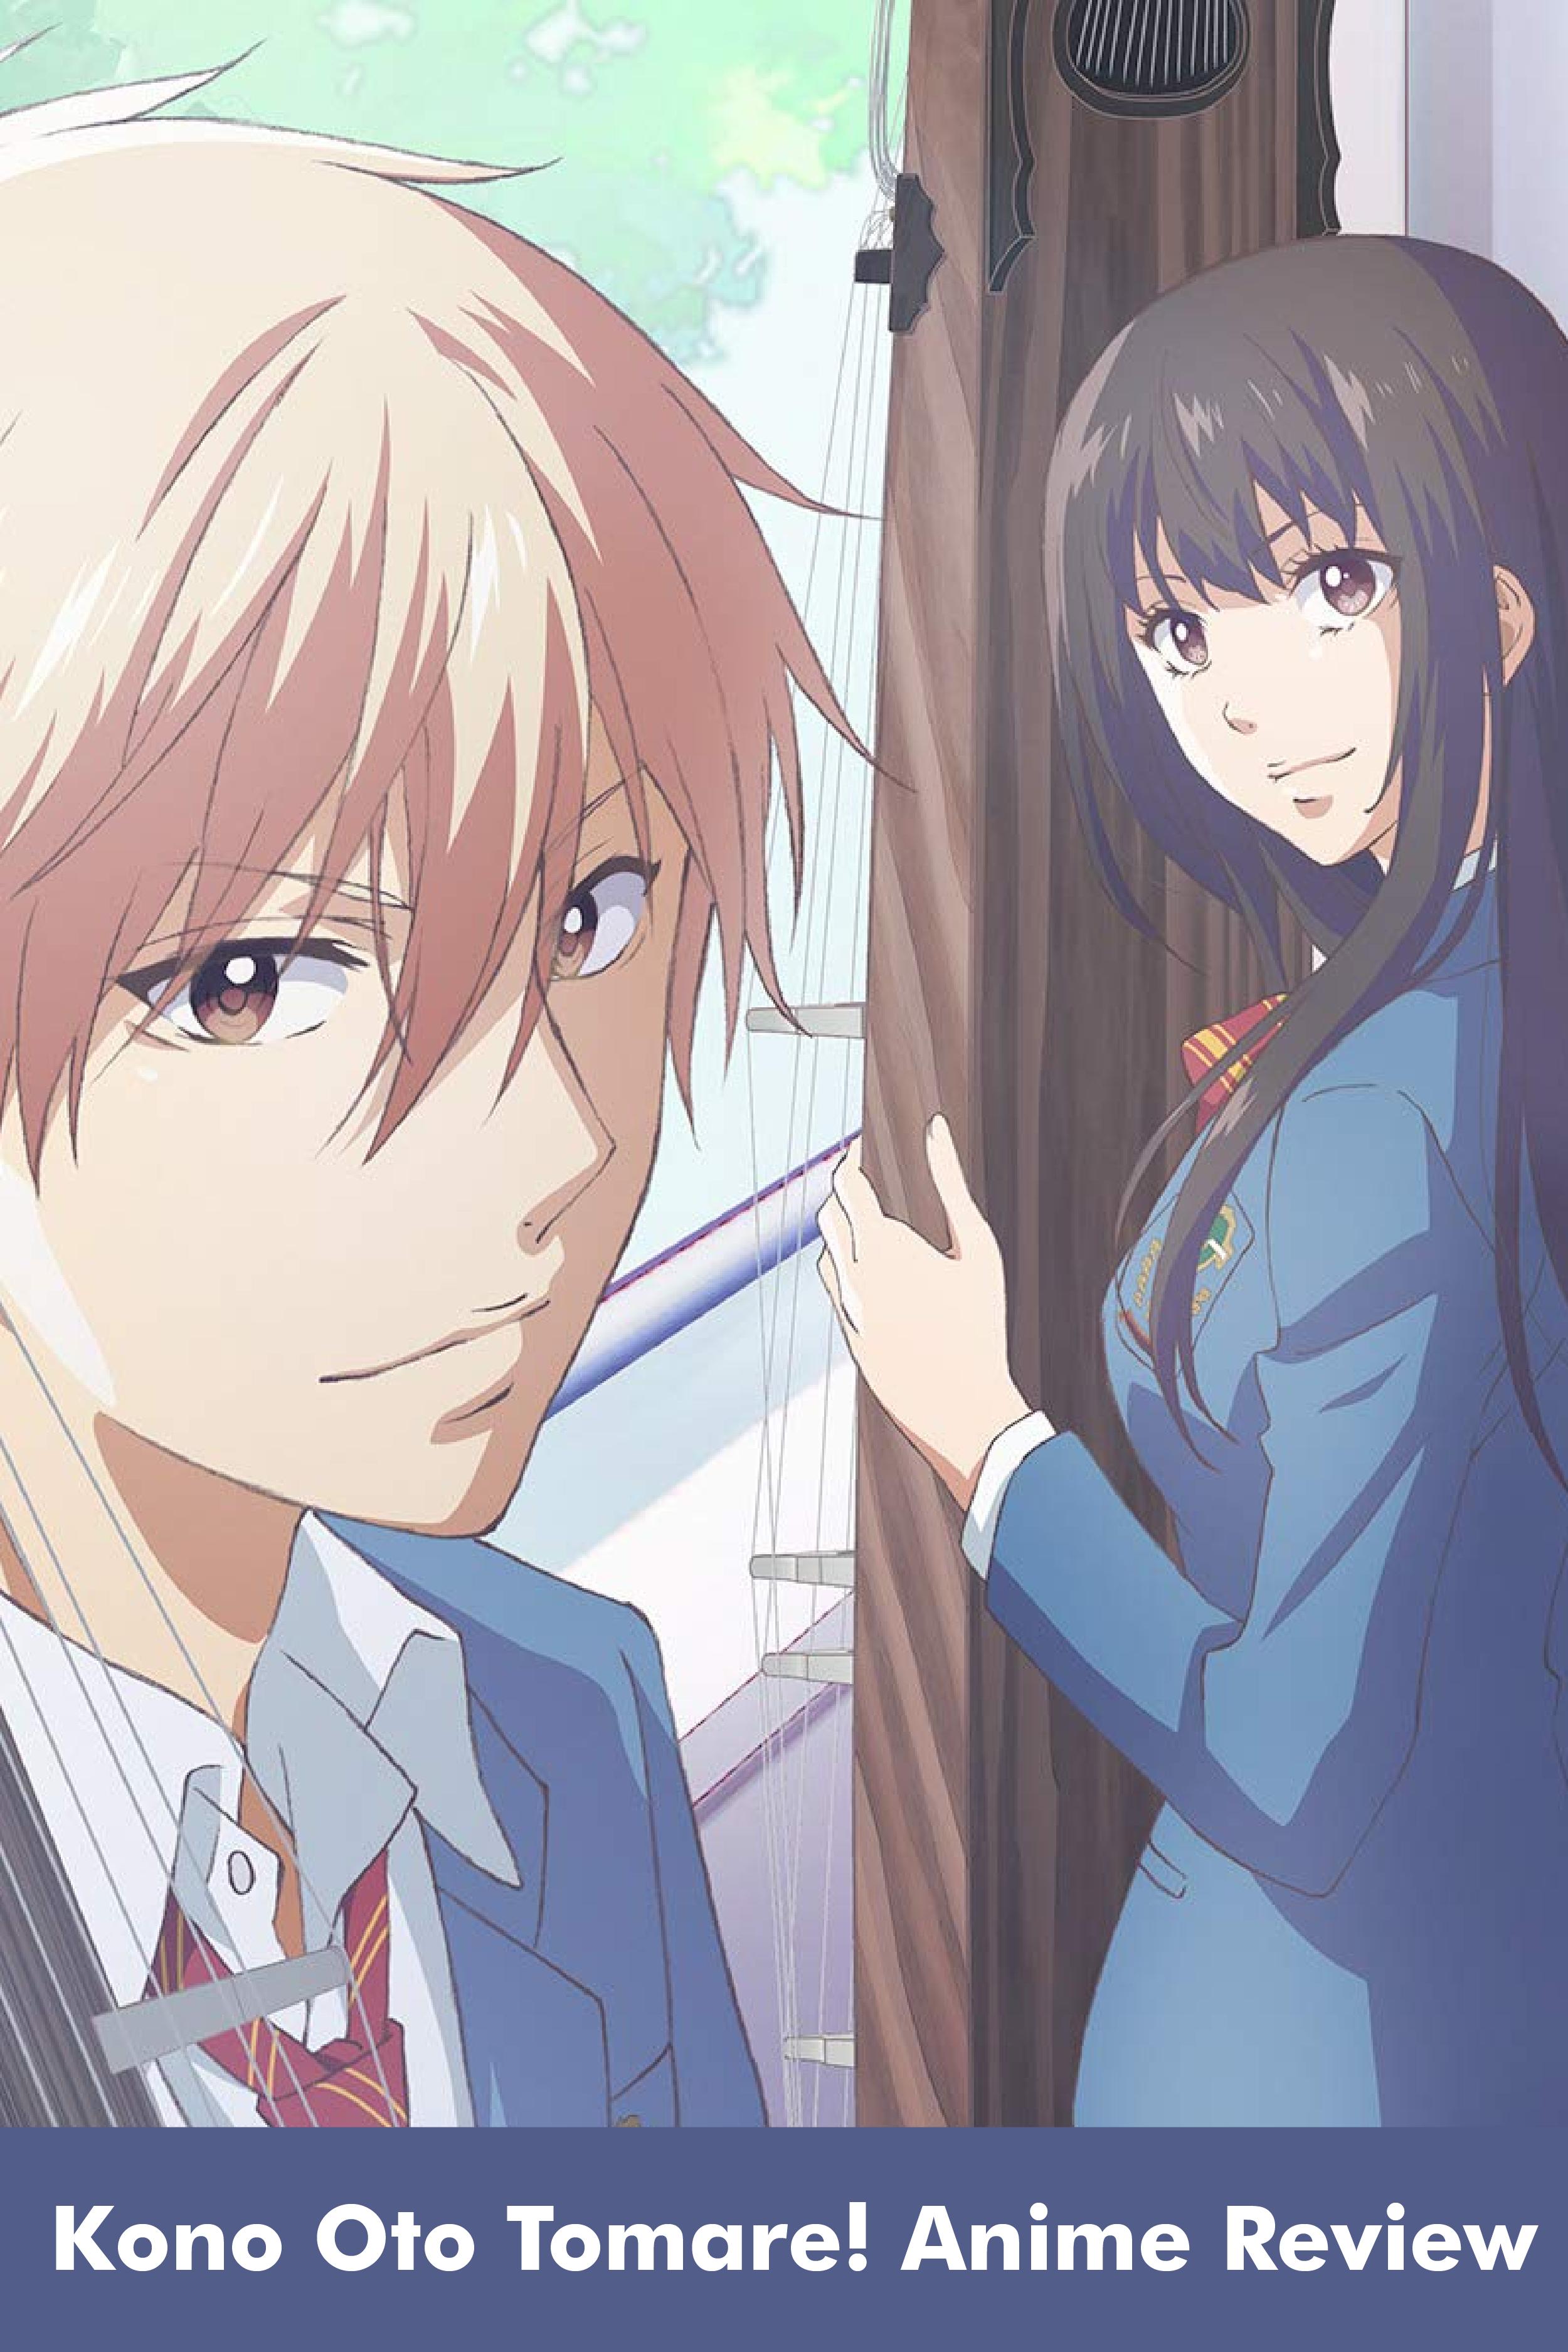 My Spring 2019 Anime Favorite Kono Oto Tomare